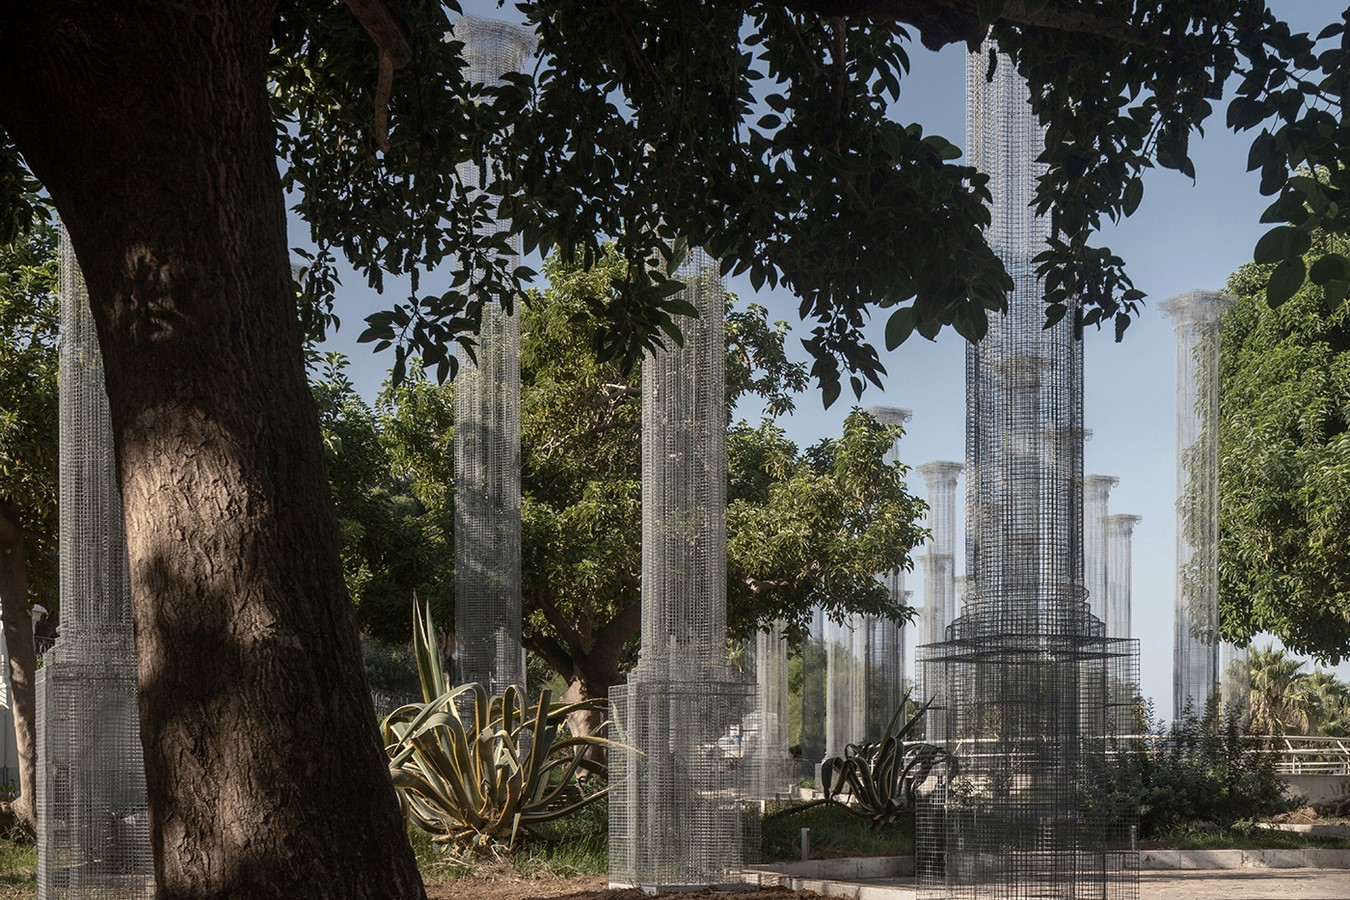 Opera,a Permanent Wire Mesh Installation in Italy revealed by Edoardo Tresoldi - Sheet5